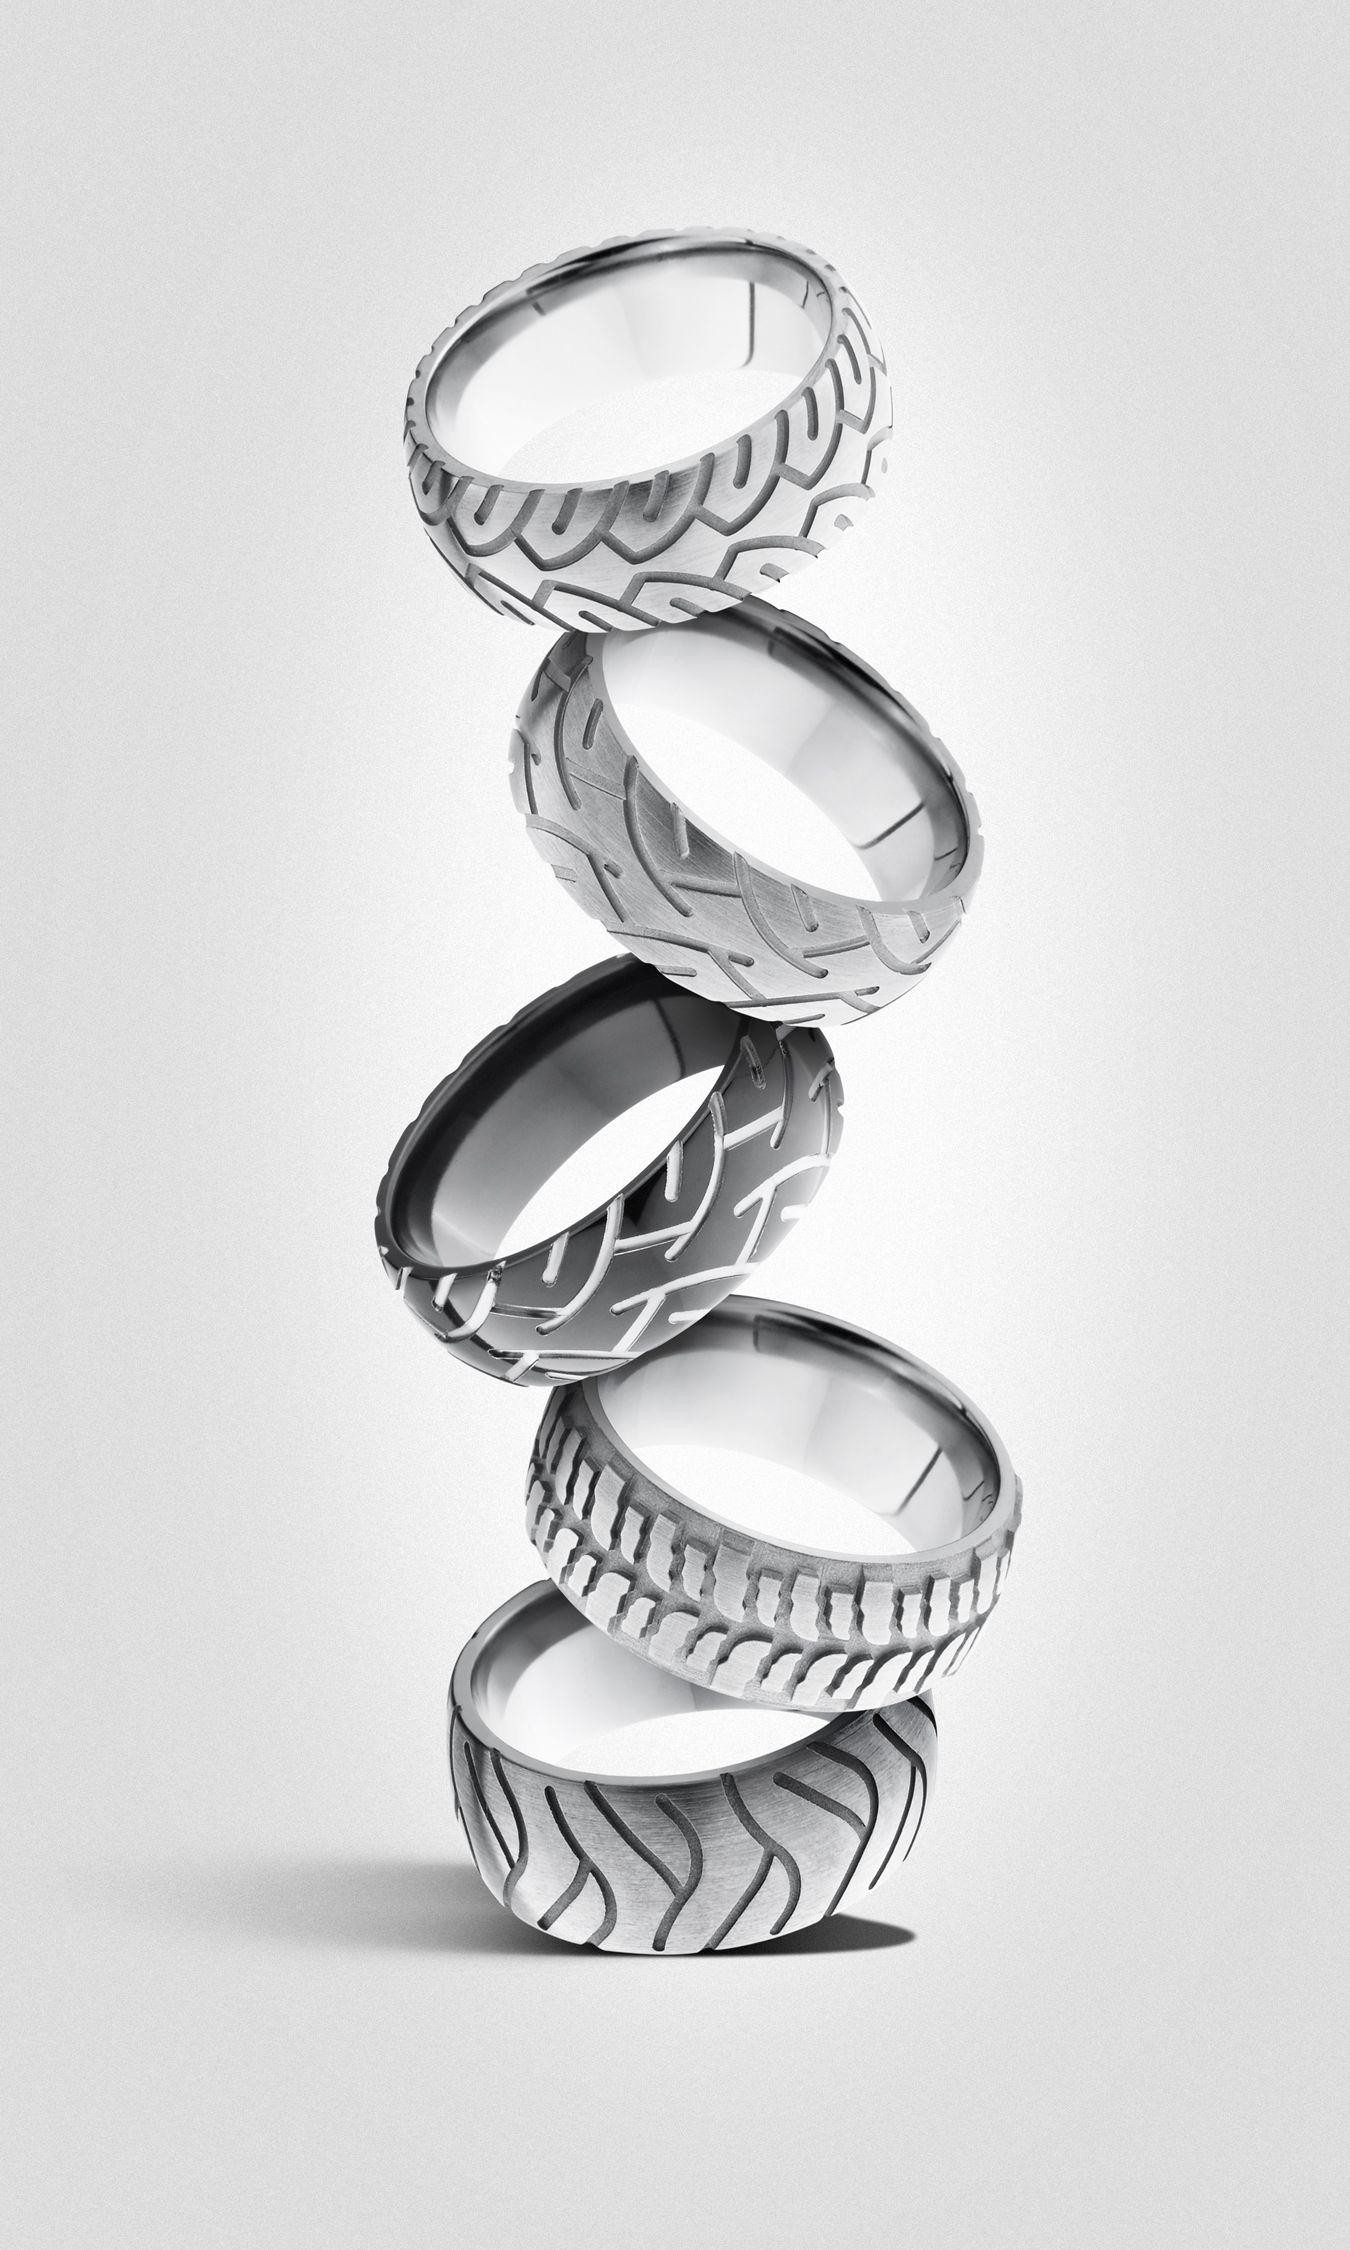 Tire tread men's rings from Lashbrook available at Dana's